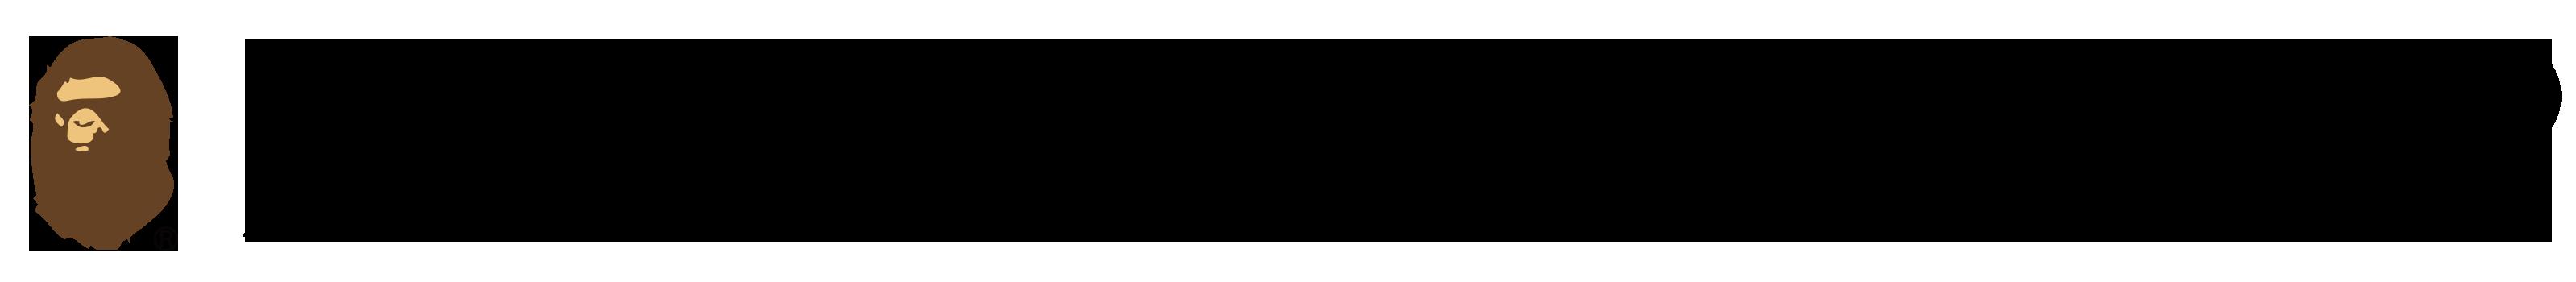 bapeonline